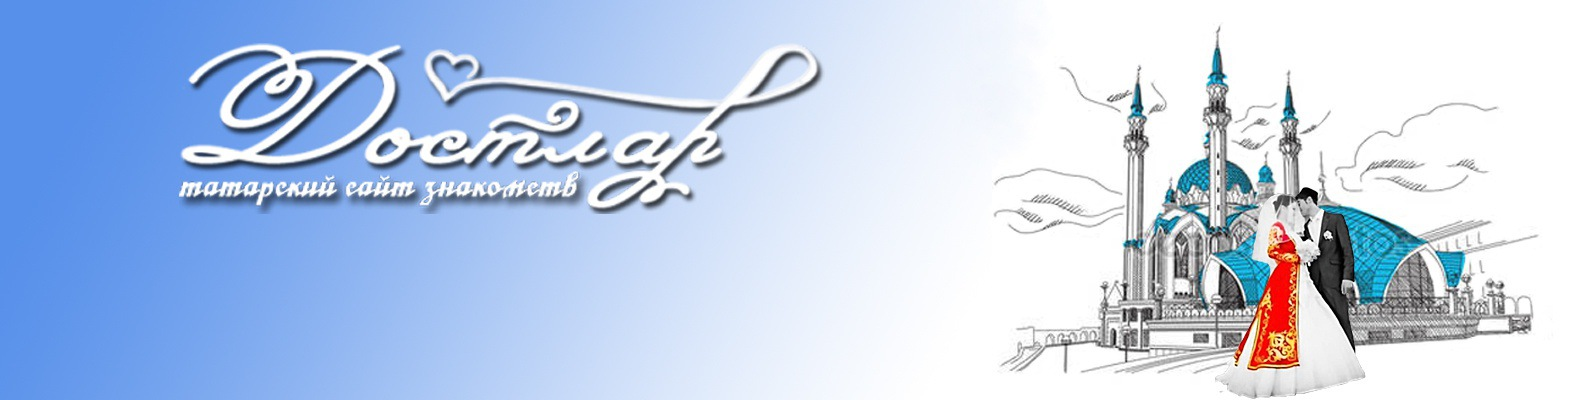 сайт достлар знакомств и татарский